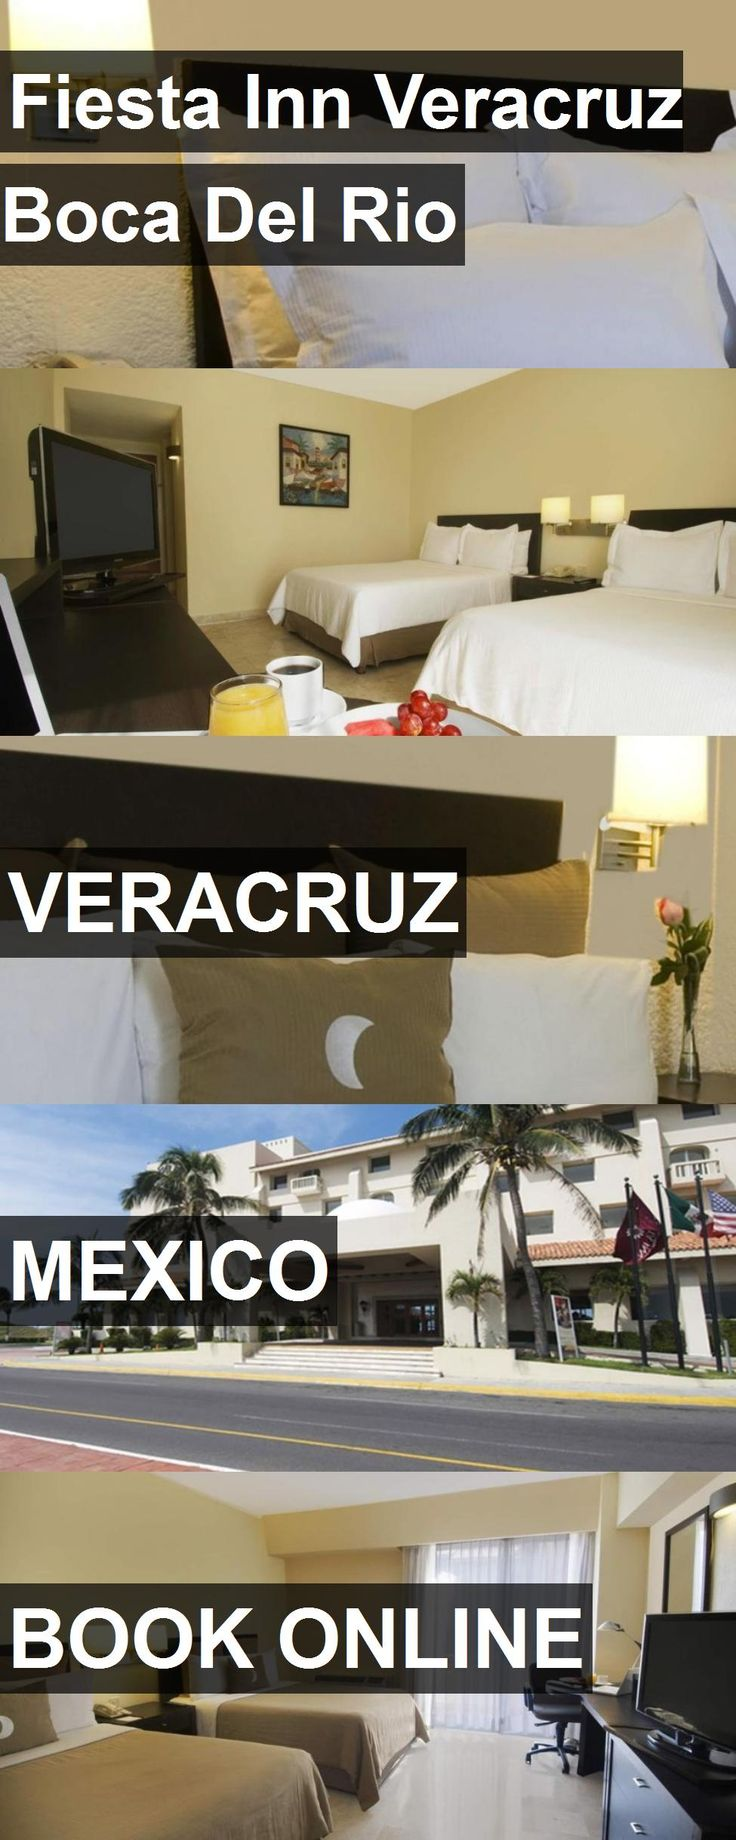 Hotel Fiesta Inn Veracruz Boca Del Rio in Veracruz, Mexico. For more information, photos, reviews and best prices please follow the link. #Mexico #Veracruz #FiestaInnVeracruzBocaDelRio #hotel #travel #vacation